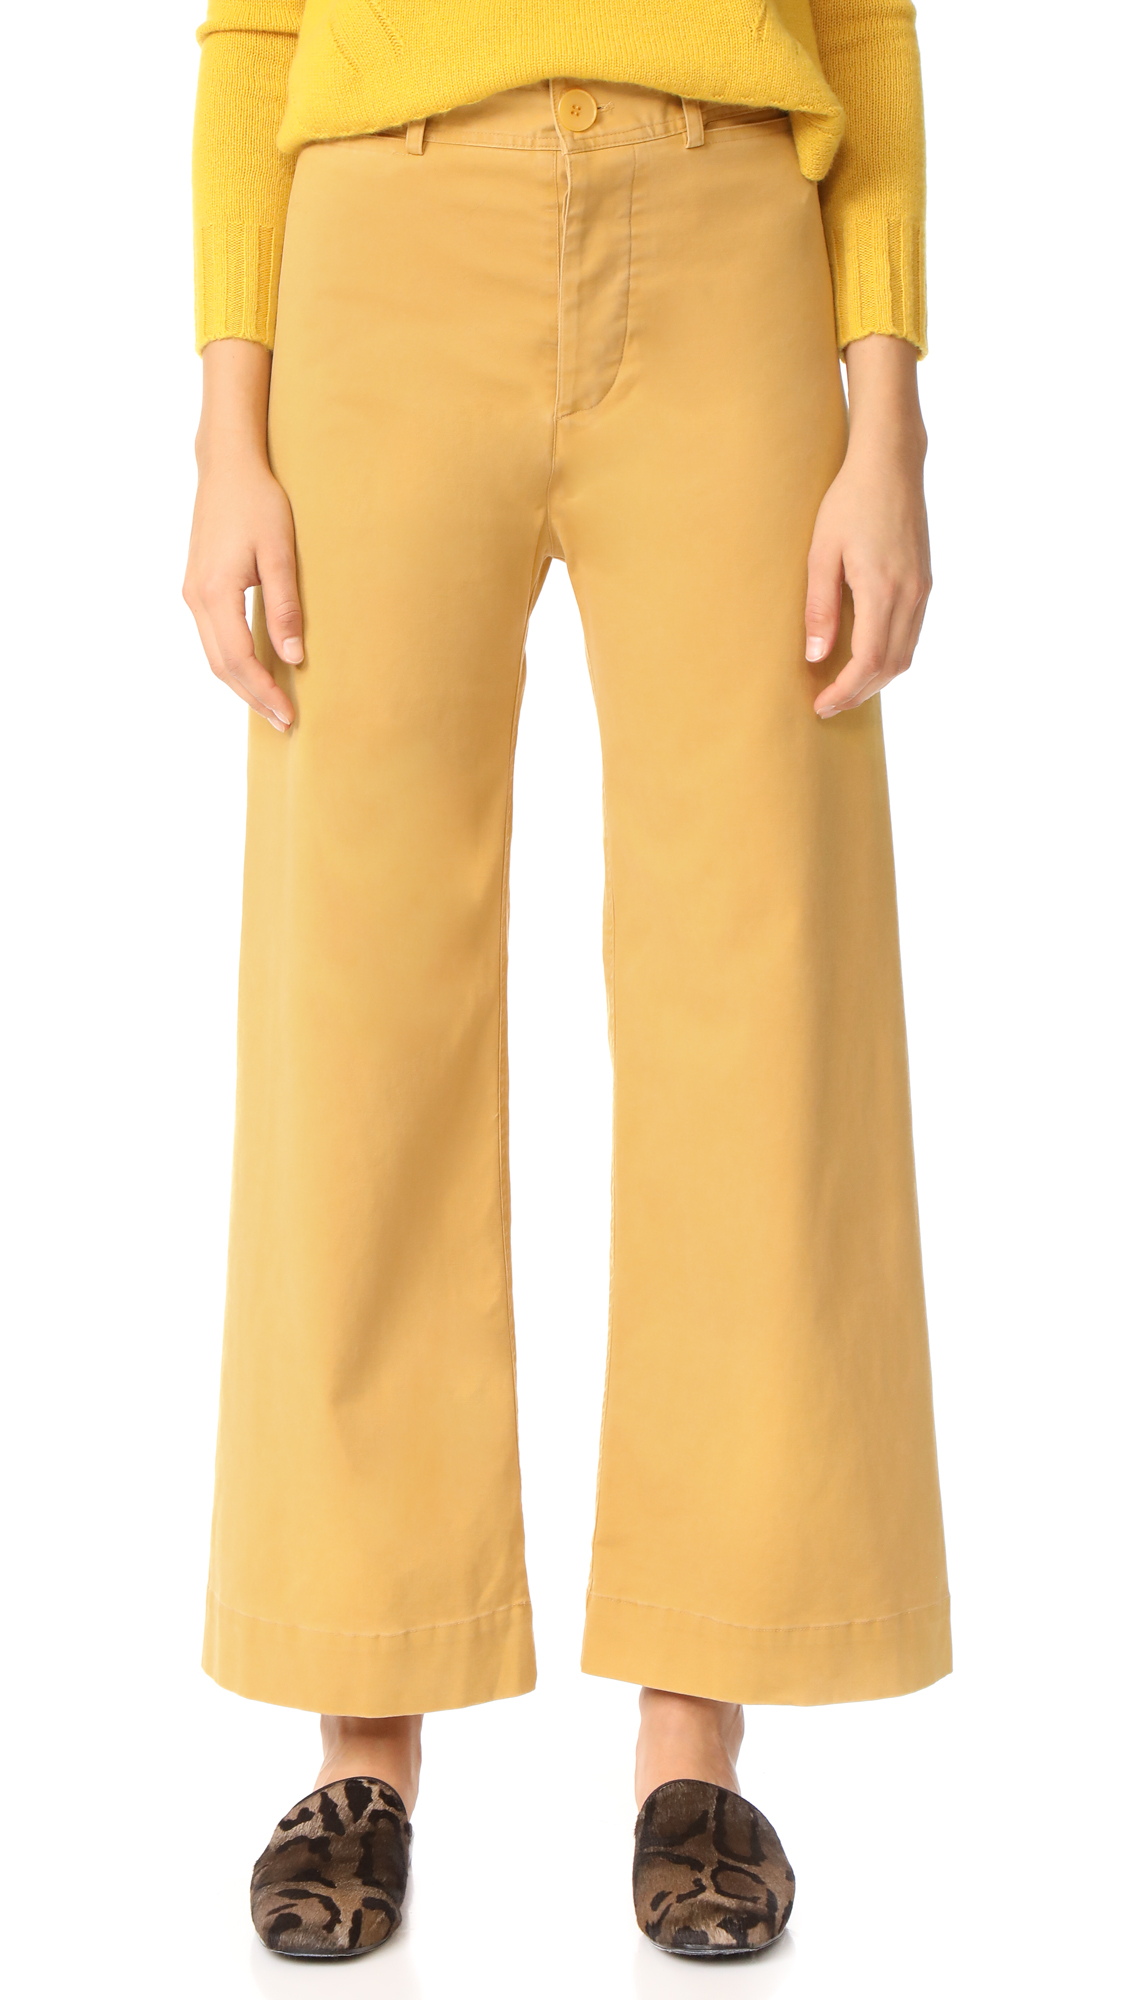 Emerson Thorpe Ryan High Waisted Pants - Mustard